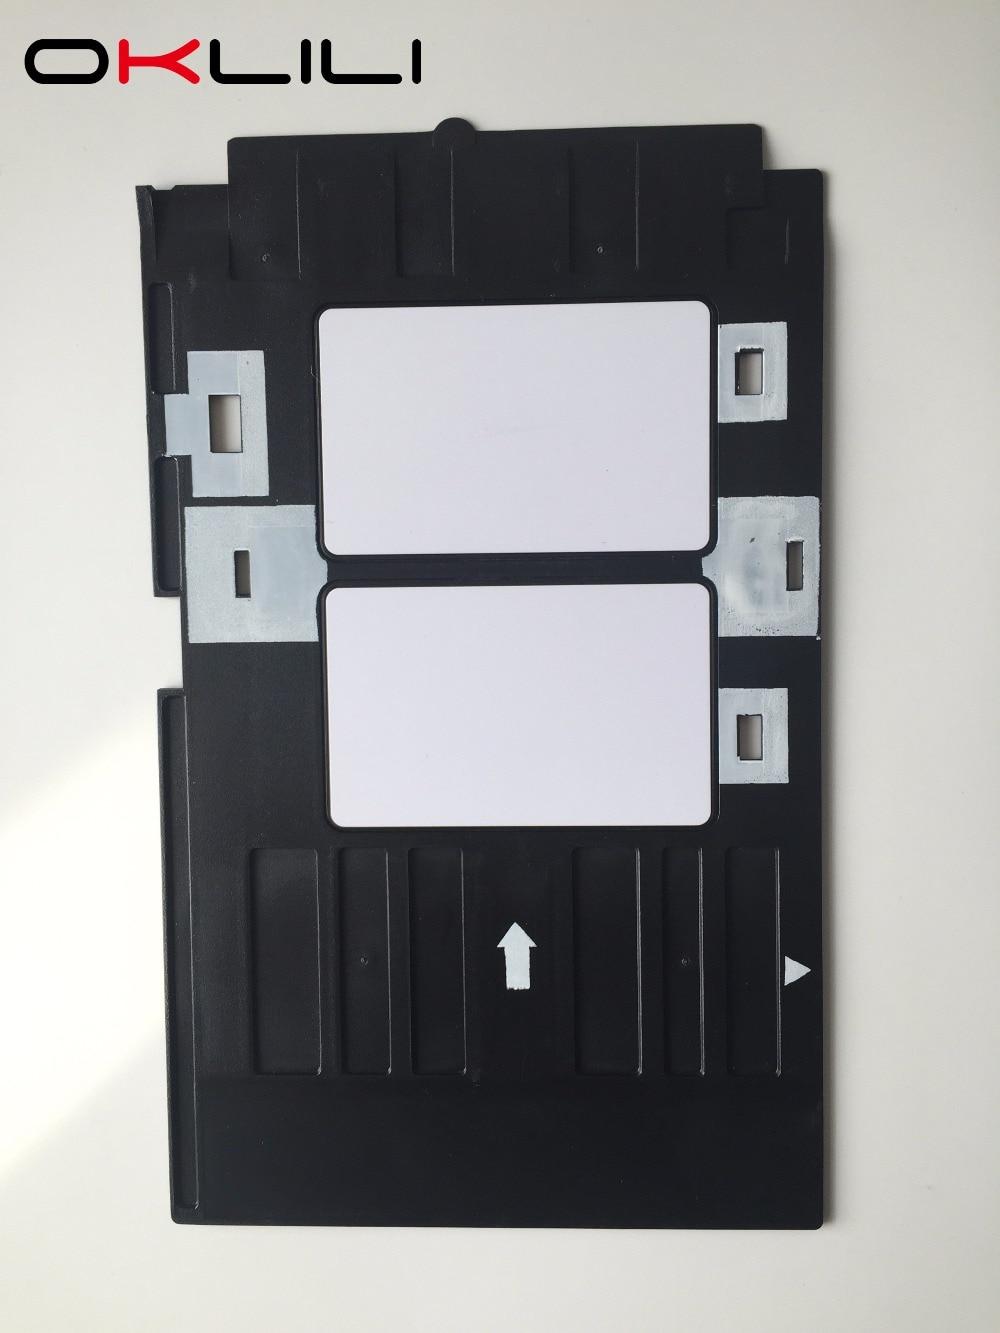 Epson R260 R265 R270 R280 R290 R380 R390 RX680 T50 T60 A50 P50 L800 - Ofis elektronikası - Fotoqrafiya 2